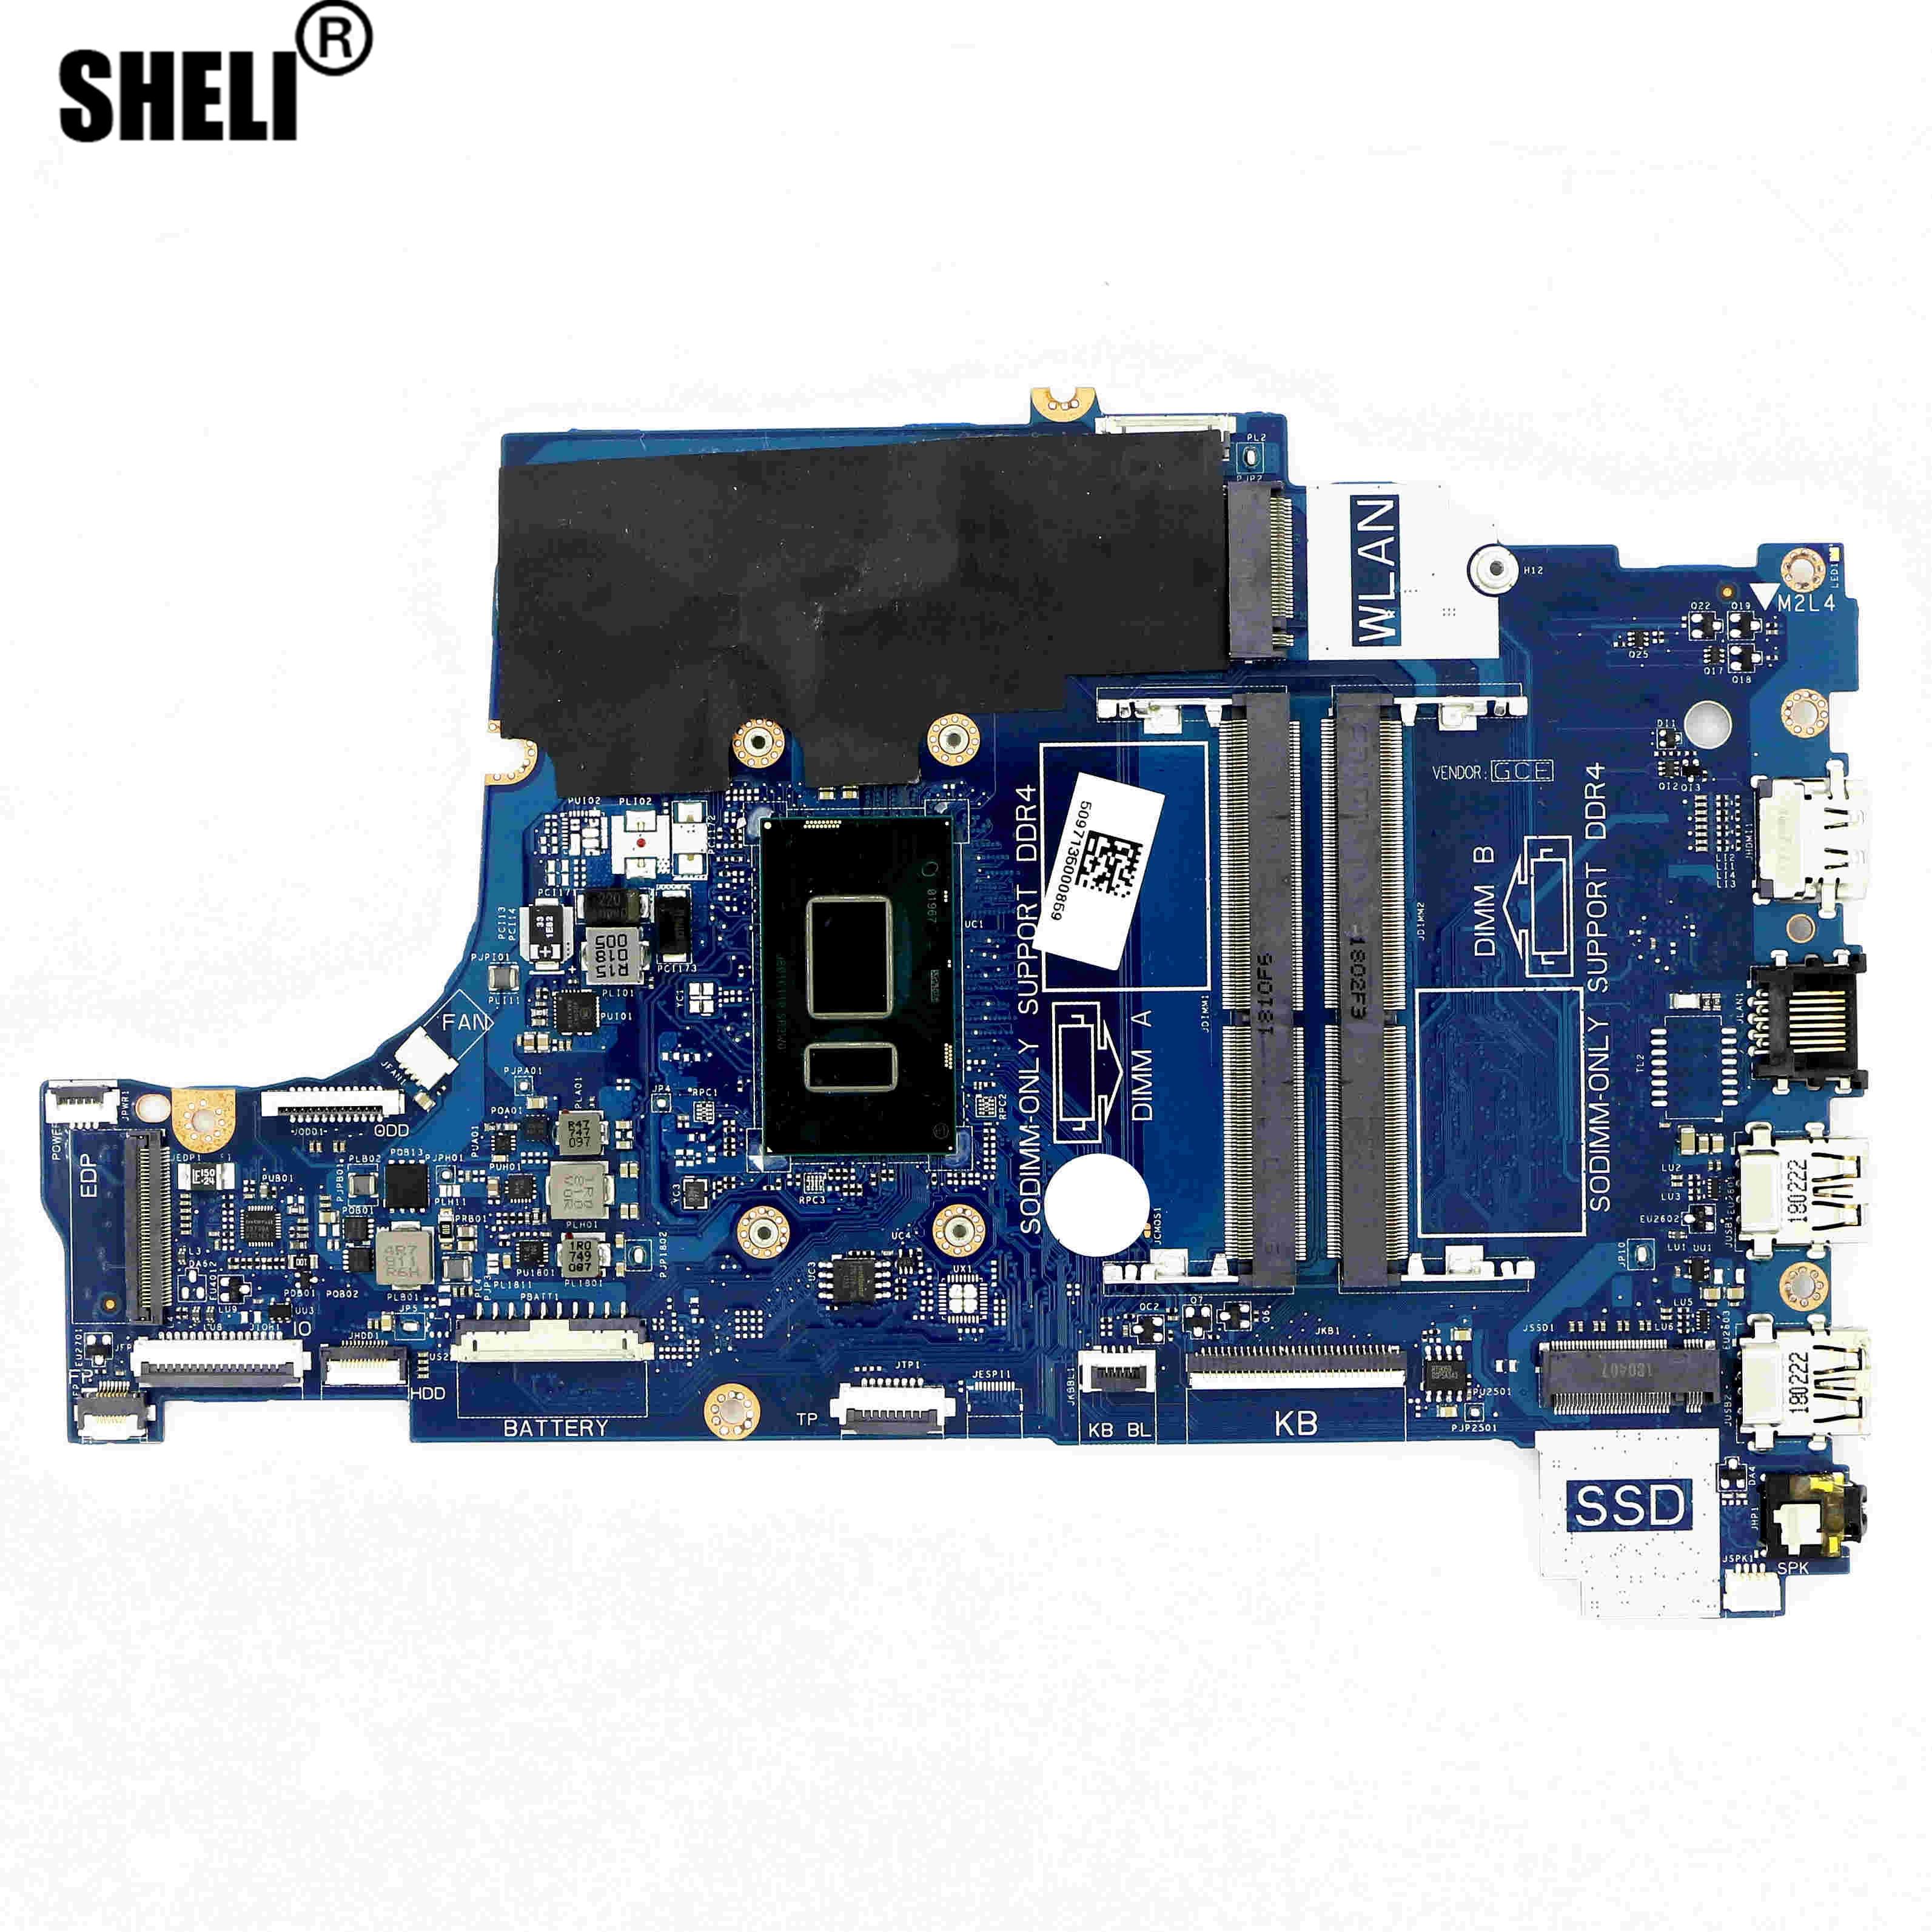 H0WK9 - UMA DDR4 материнская плата CAL60 LA-F114P w/ i3-8130U 2,2 GHz для DELL Inspiron 15 (5570) / 17 (5770)